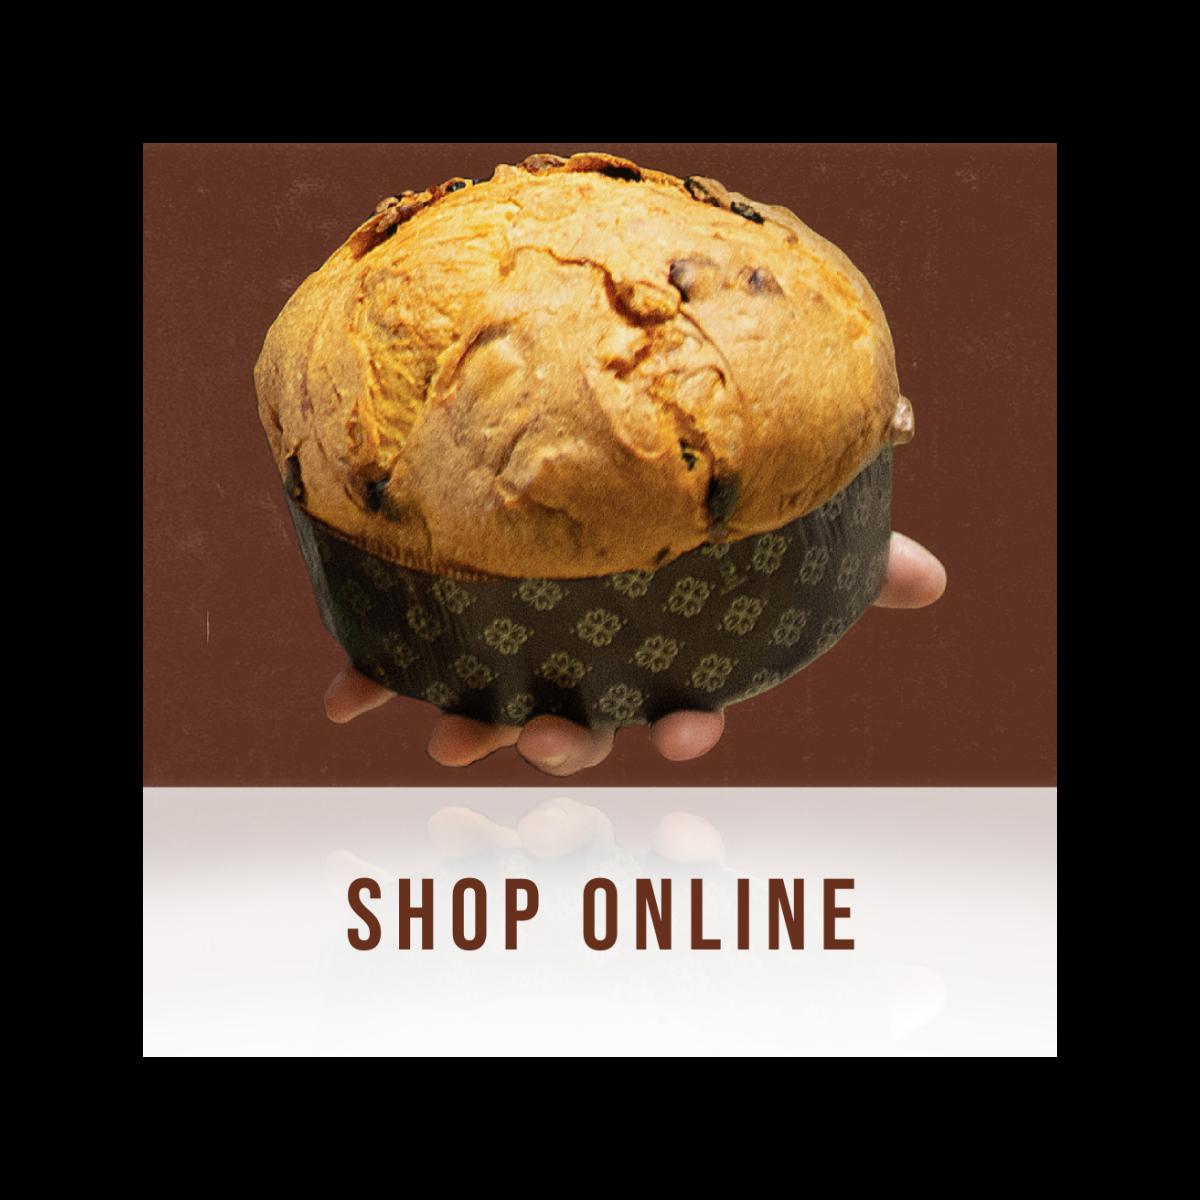 Elzi - Shop Online